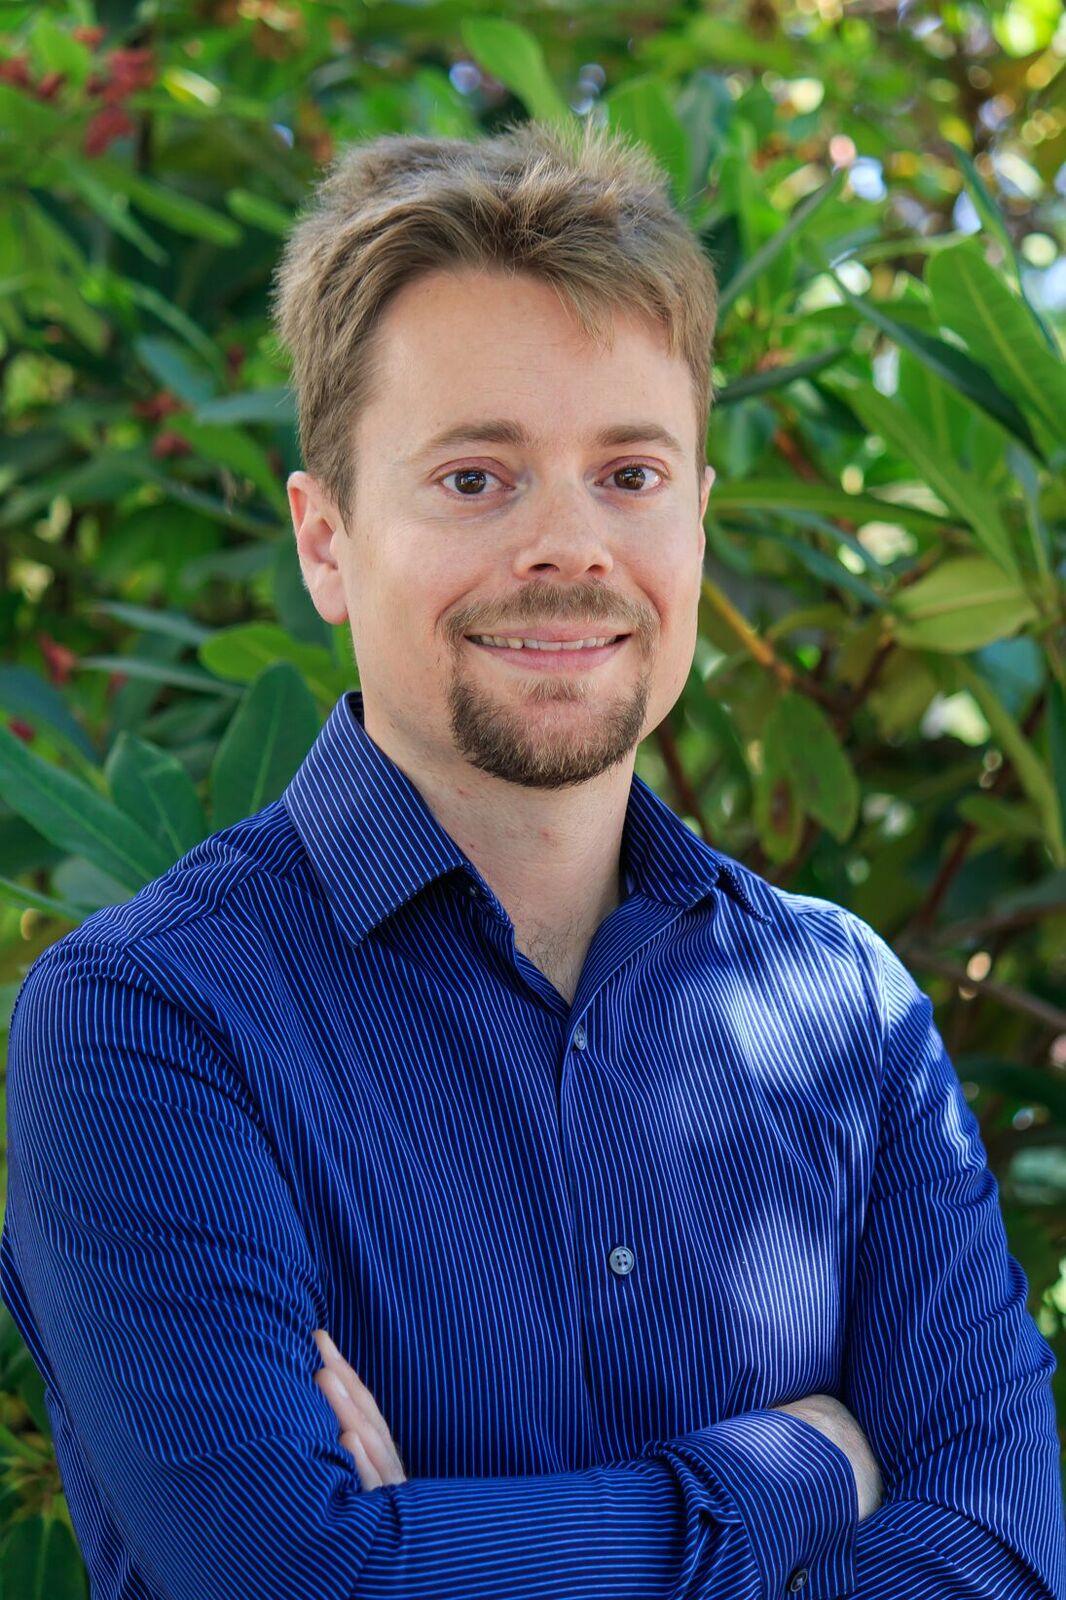 Matt Dorris